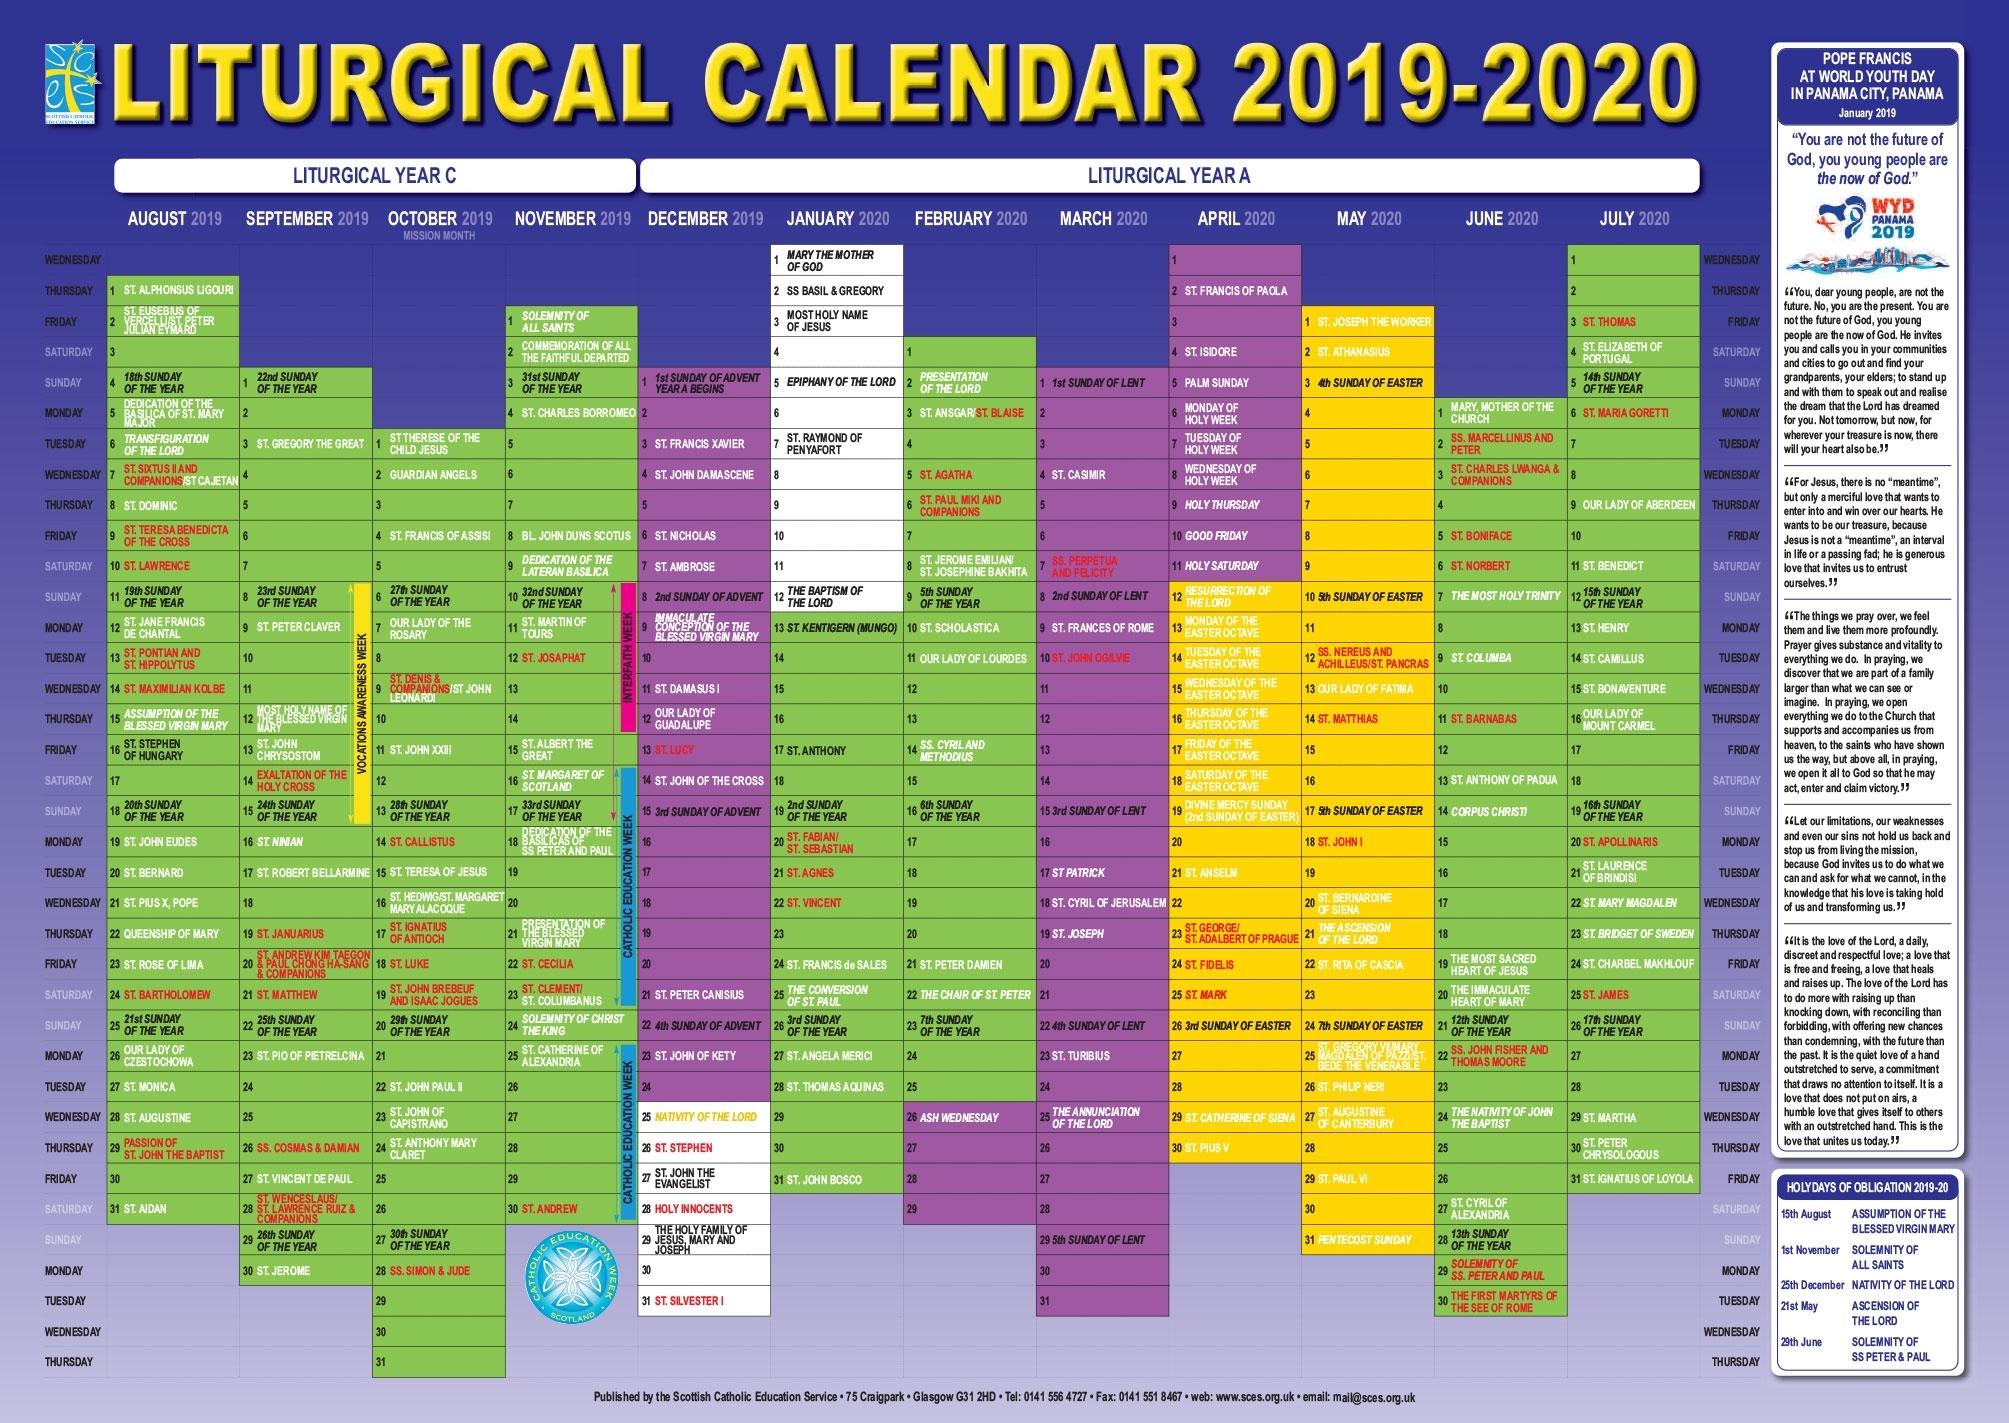 Scottish Catholic Education Service   Sces   Liturgical with regard to Catholic Liturgical Calendar For Lent 2020